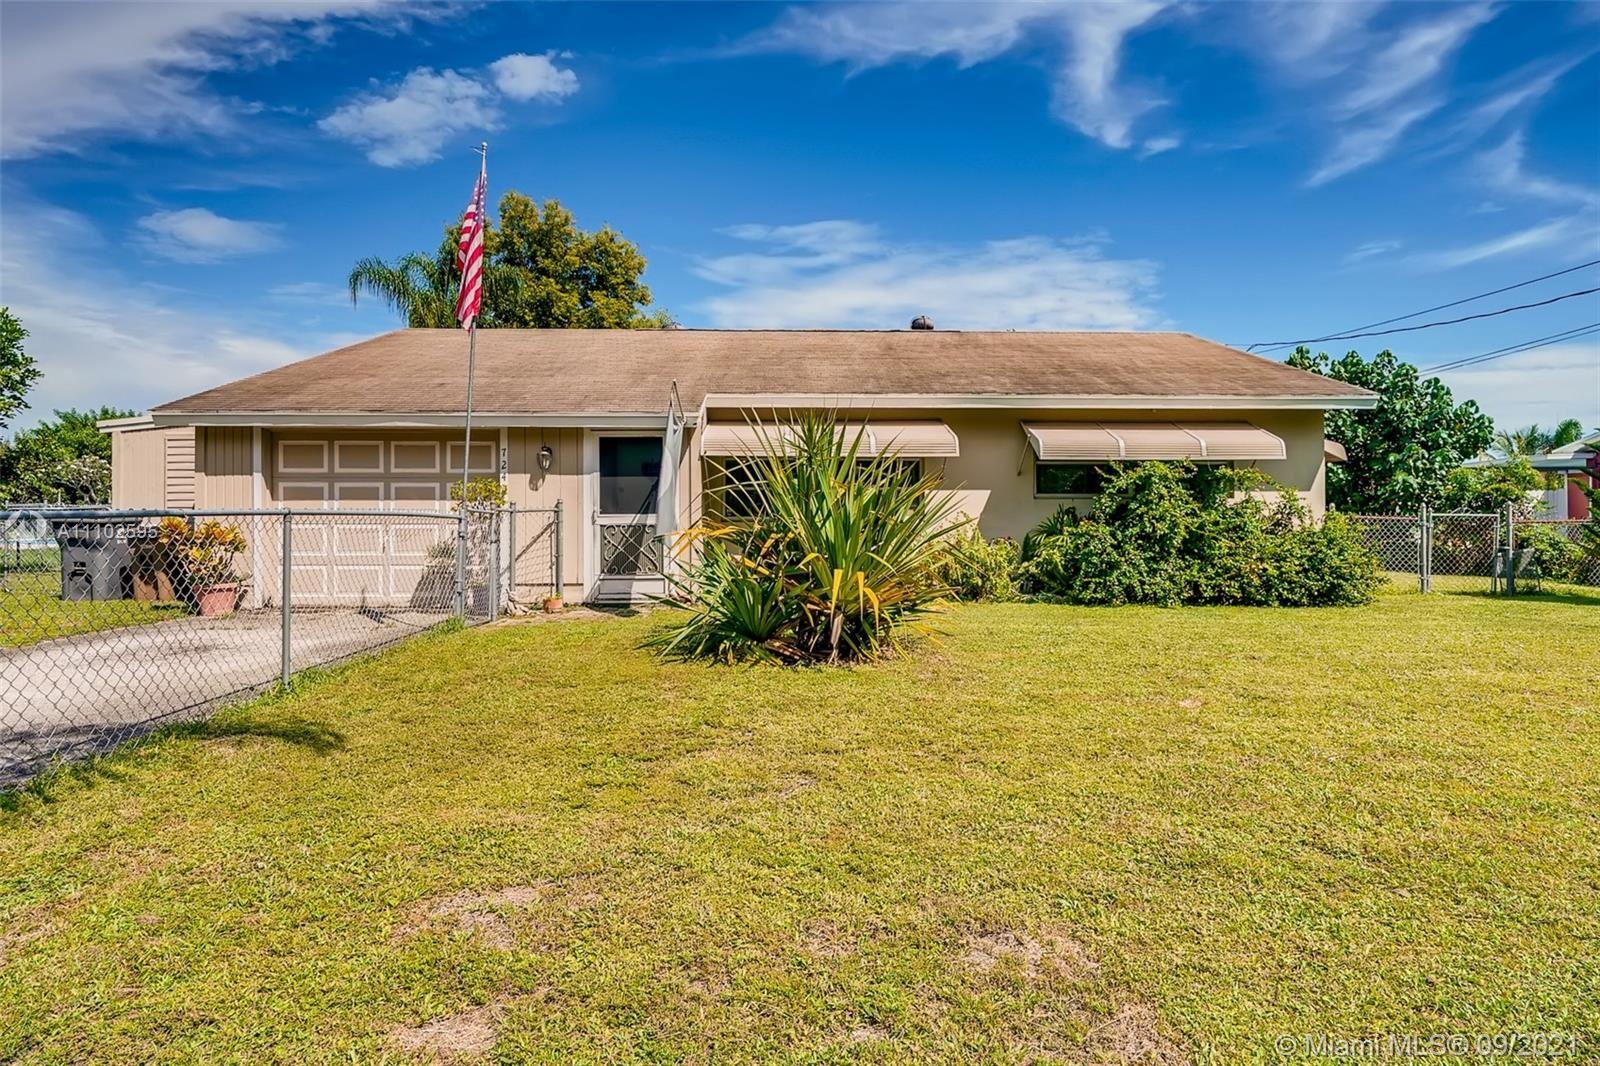 724 Arnold Dr, West Palm Beach, FL 33415 - #: A11102595